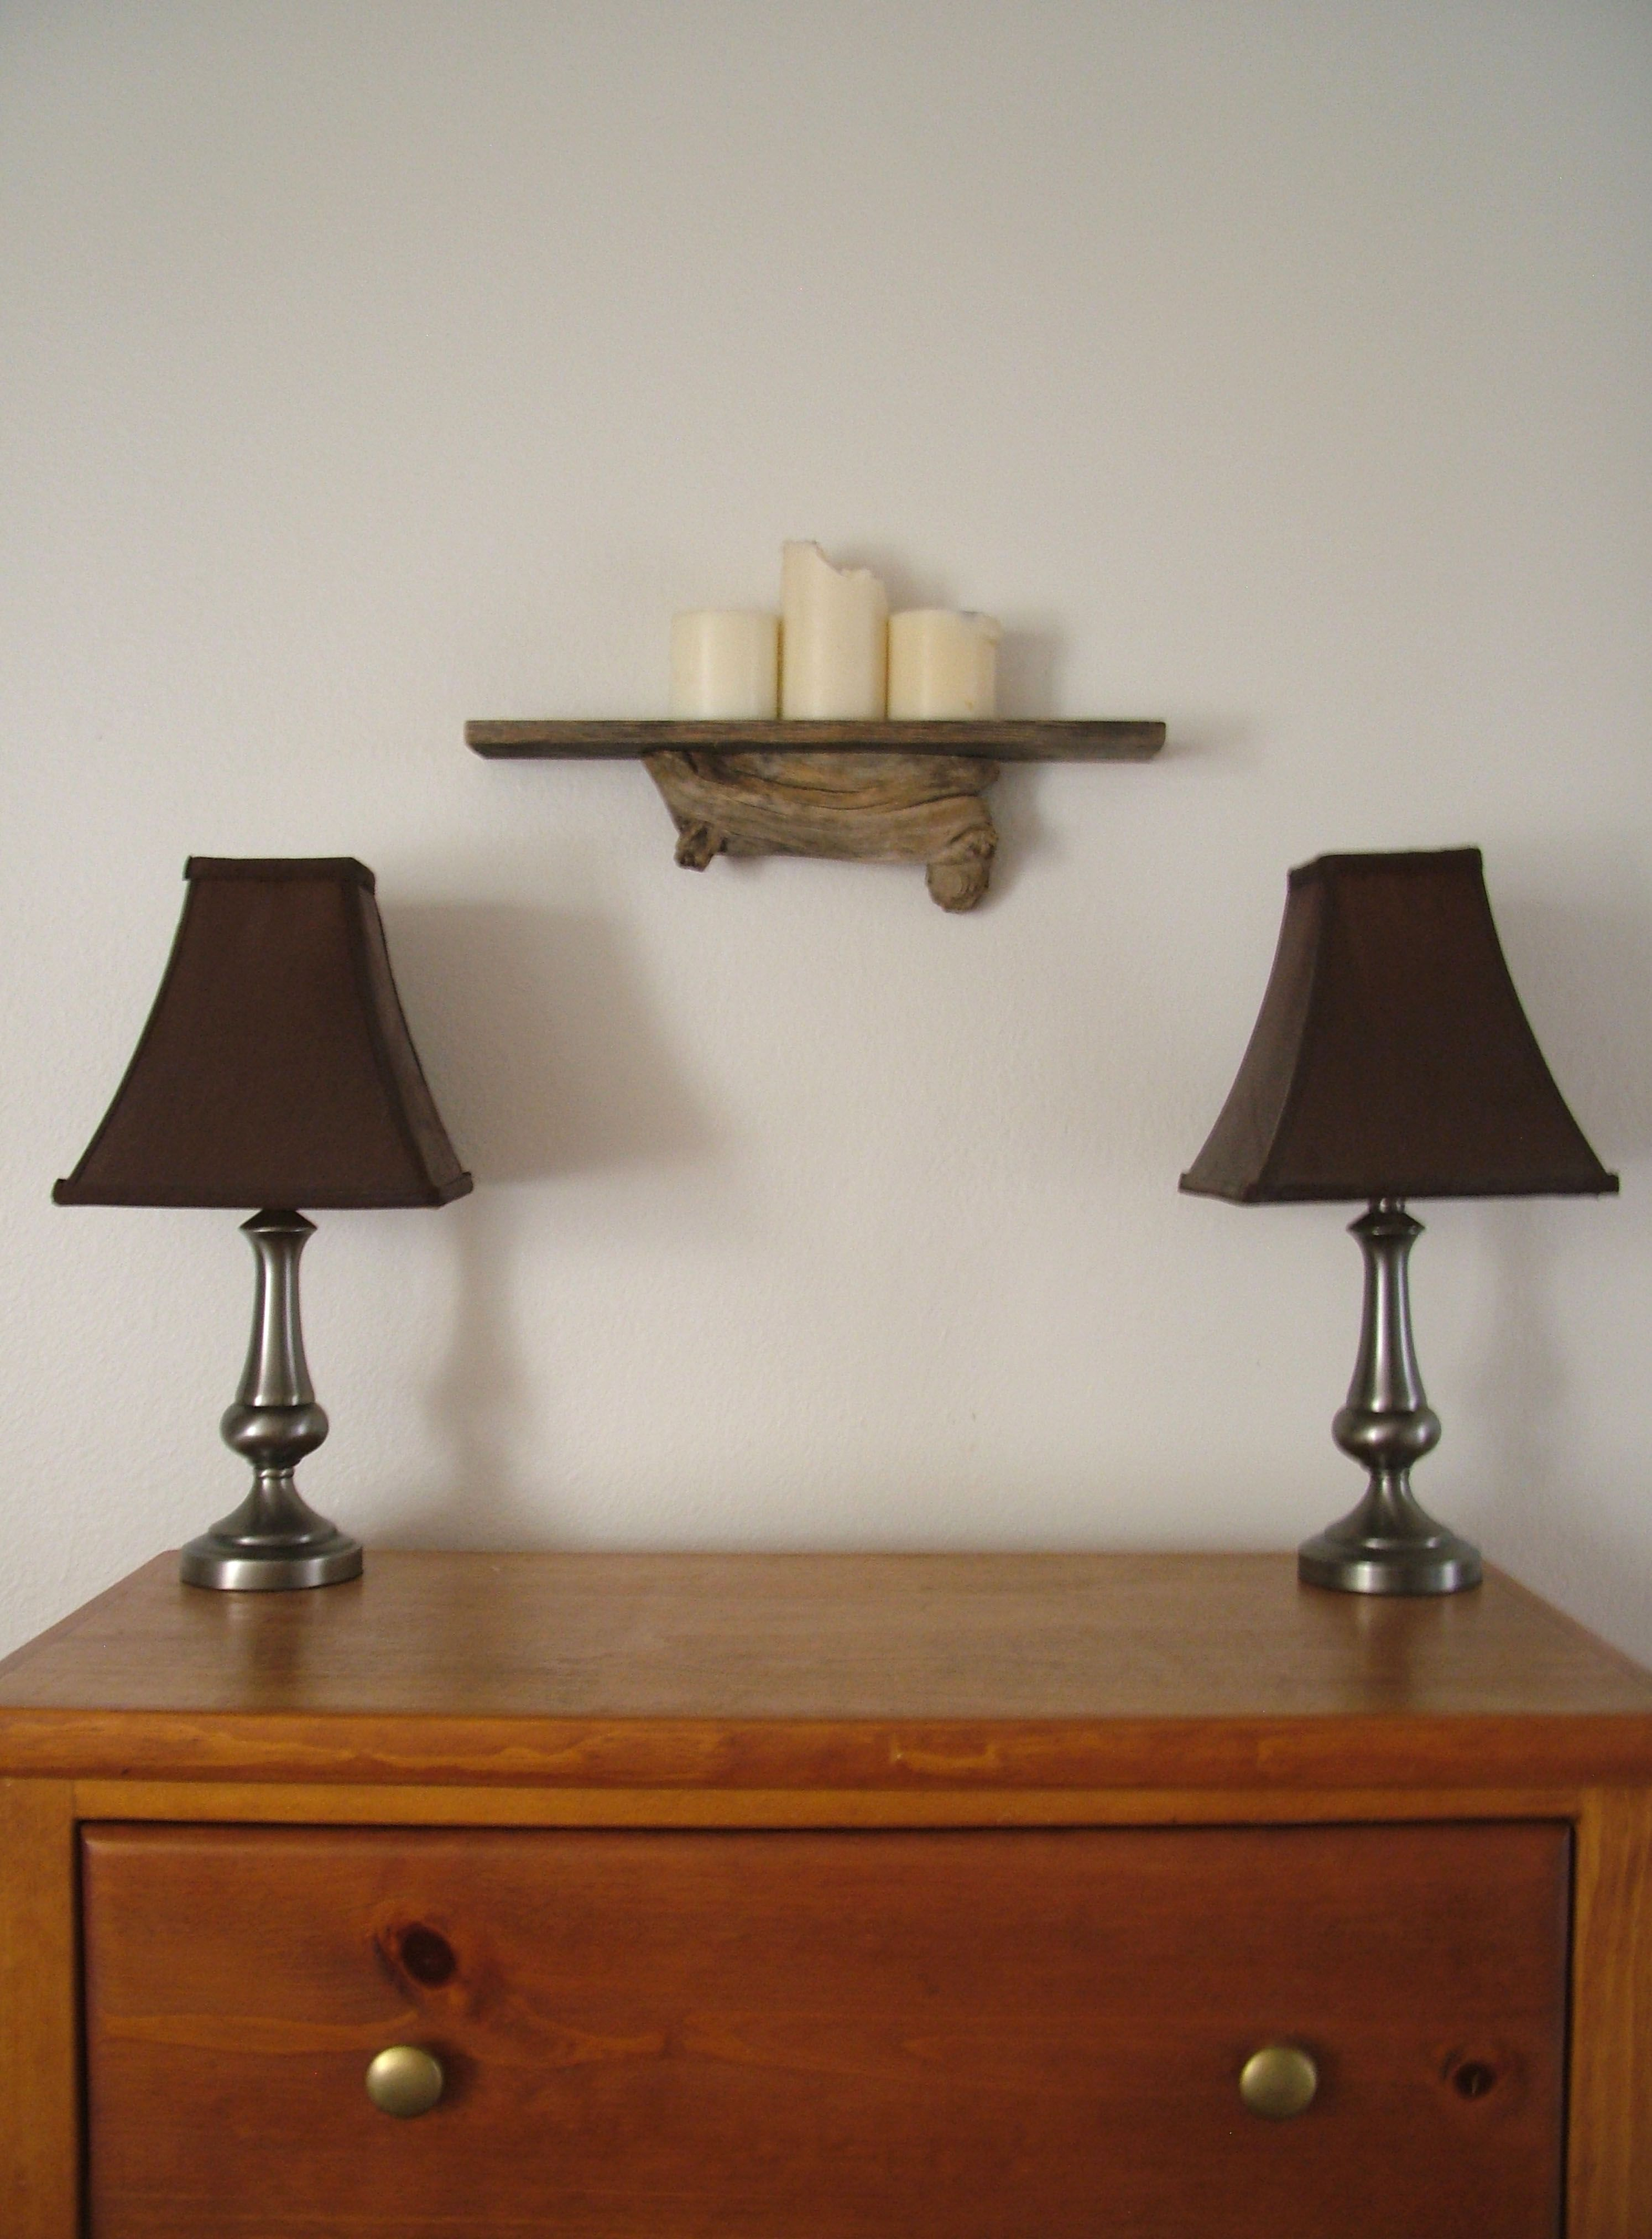 DIY log shelf! my love made this for me. Desk lamp, Lamp